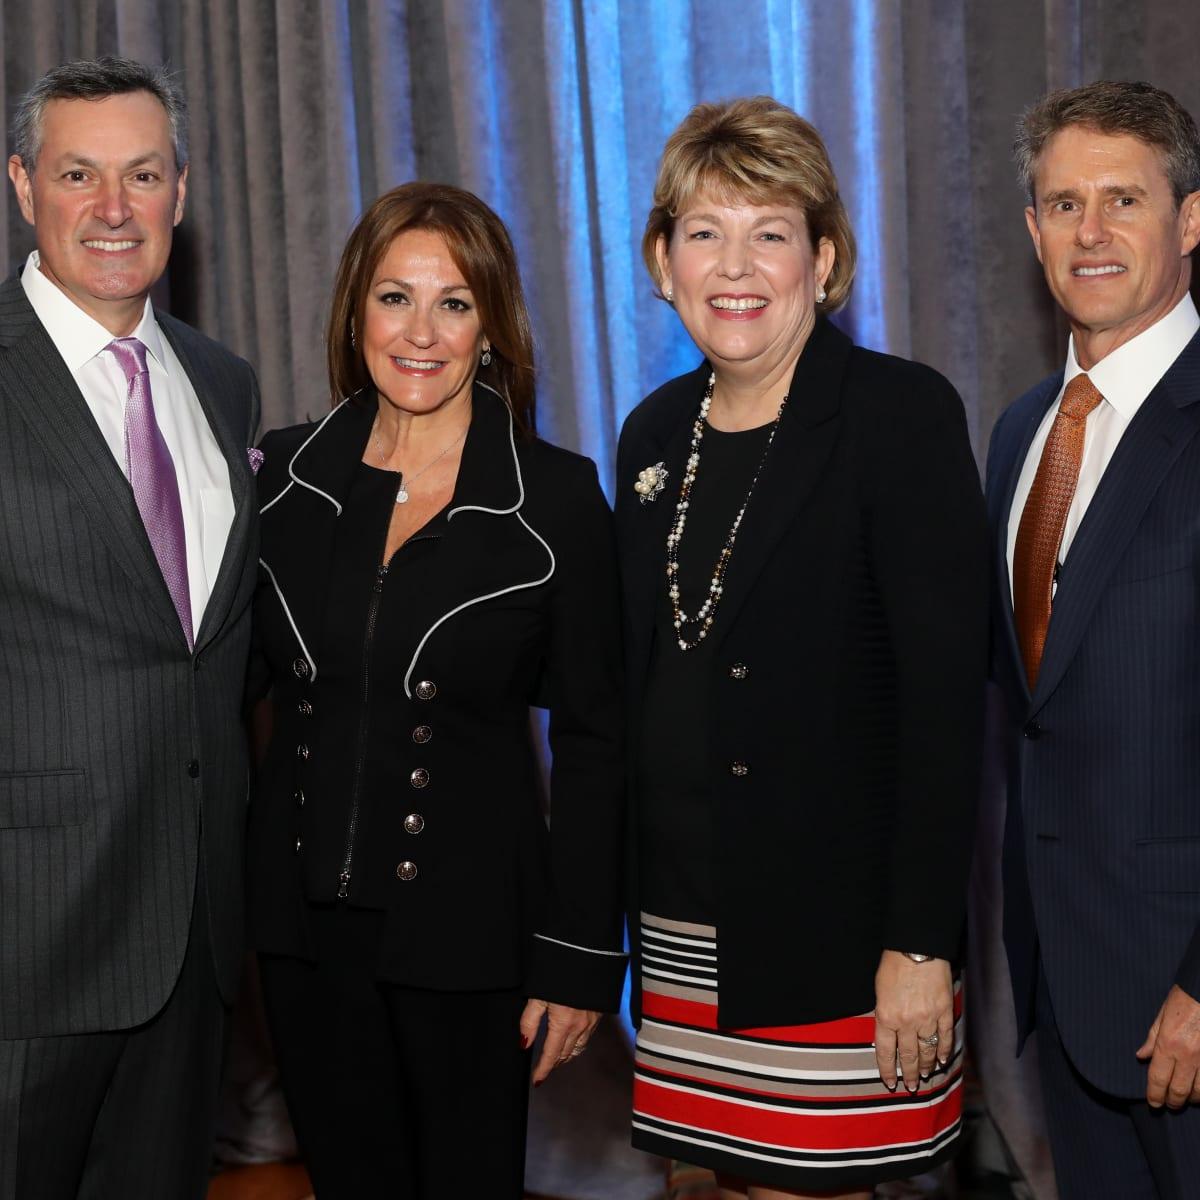 Houston, University of Texas at Austin Guardian of the Human Spirit Award Luncheon, November 2017, Gary Markowitz, Tali Blumrosen, Dr. Kelly J. Zúñiga, Eric Blumrosen